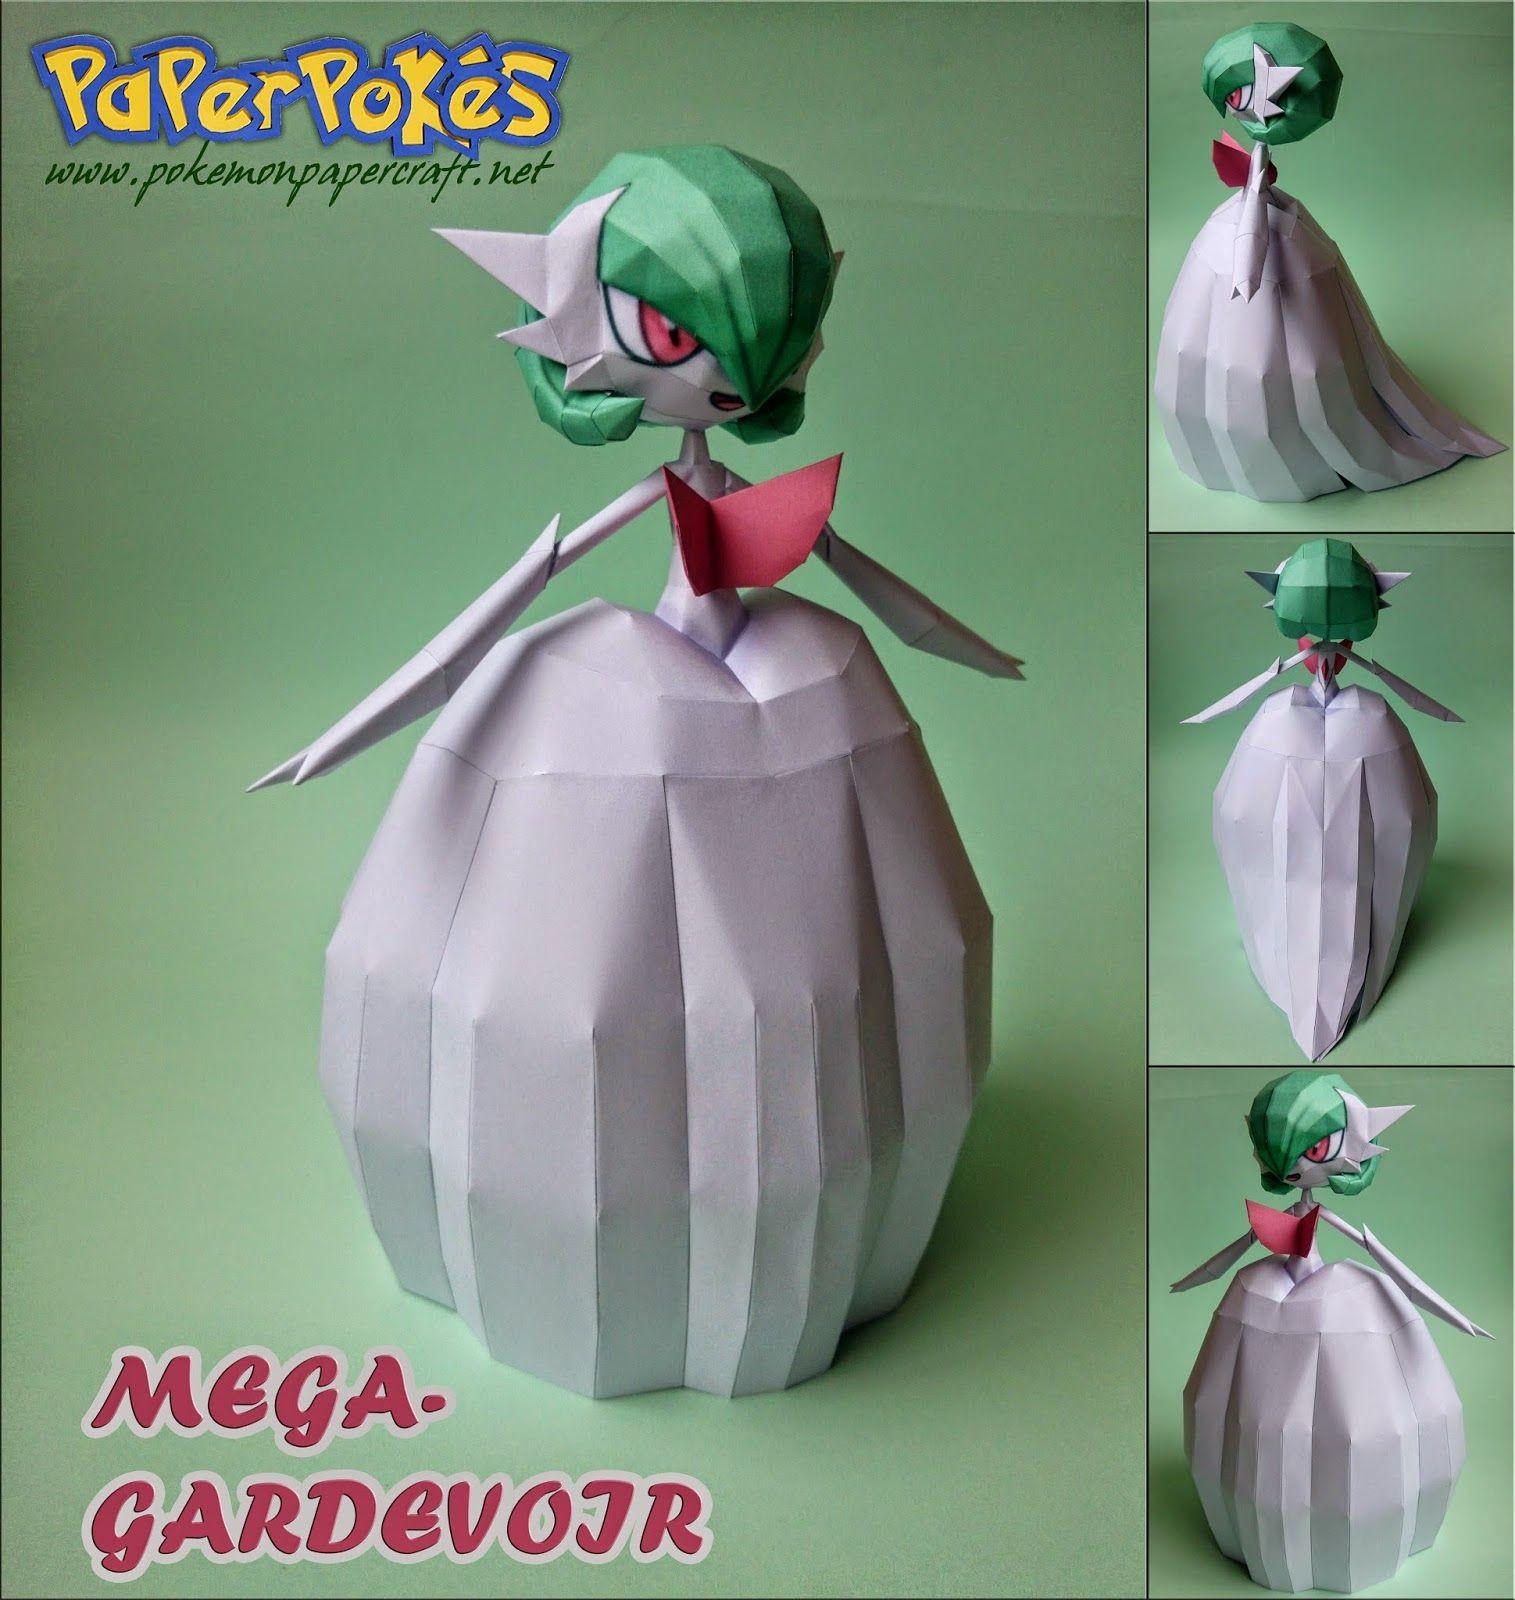 Ninja Papercraft Paperpokés Pokémon Papercrafts Mega Gardevoir